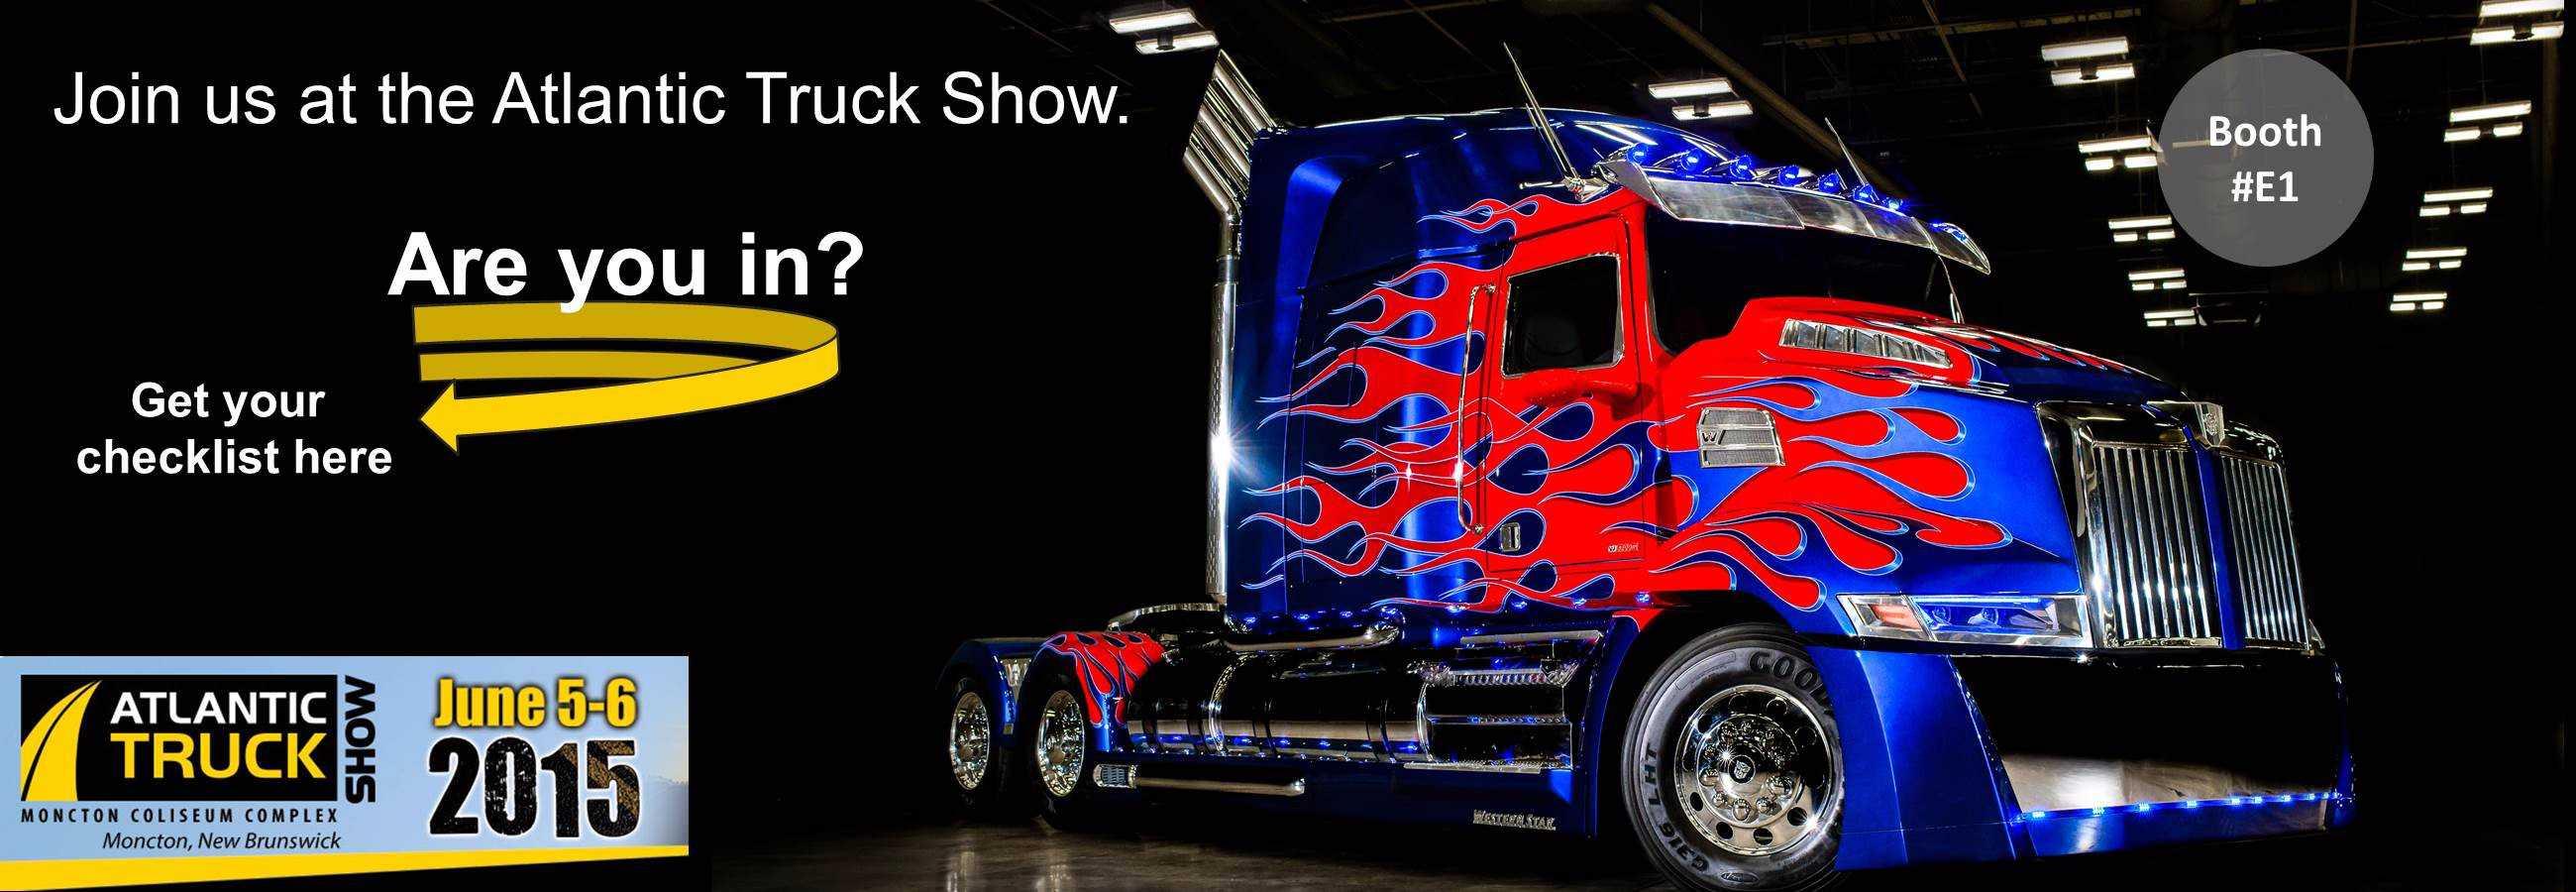 2015 Atlantic Truck Show